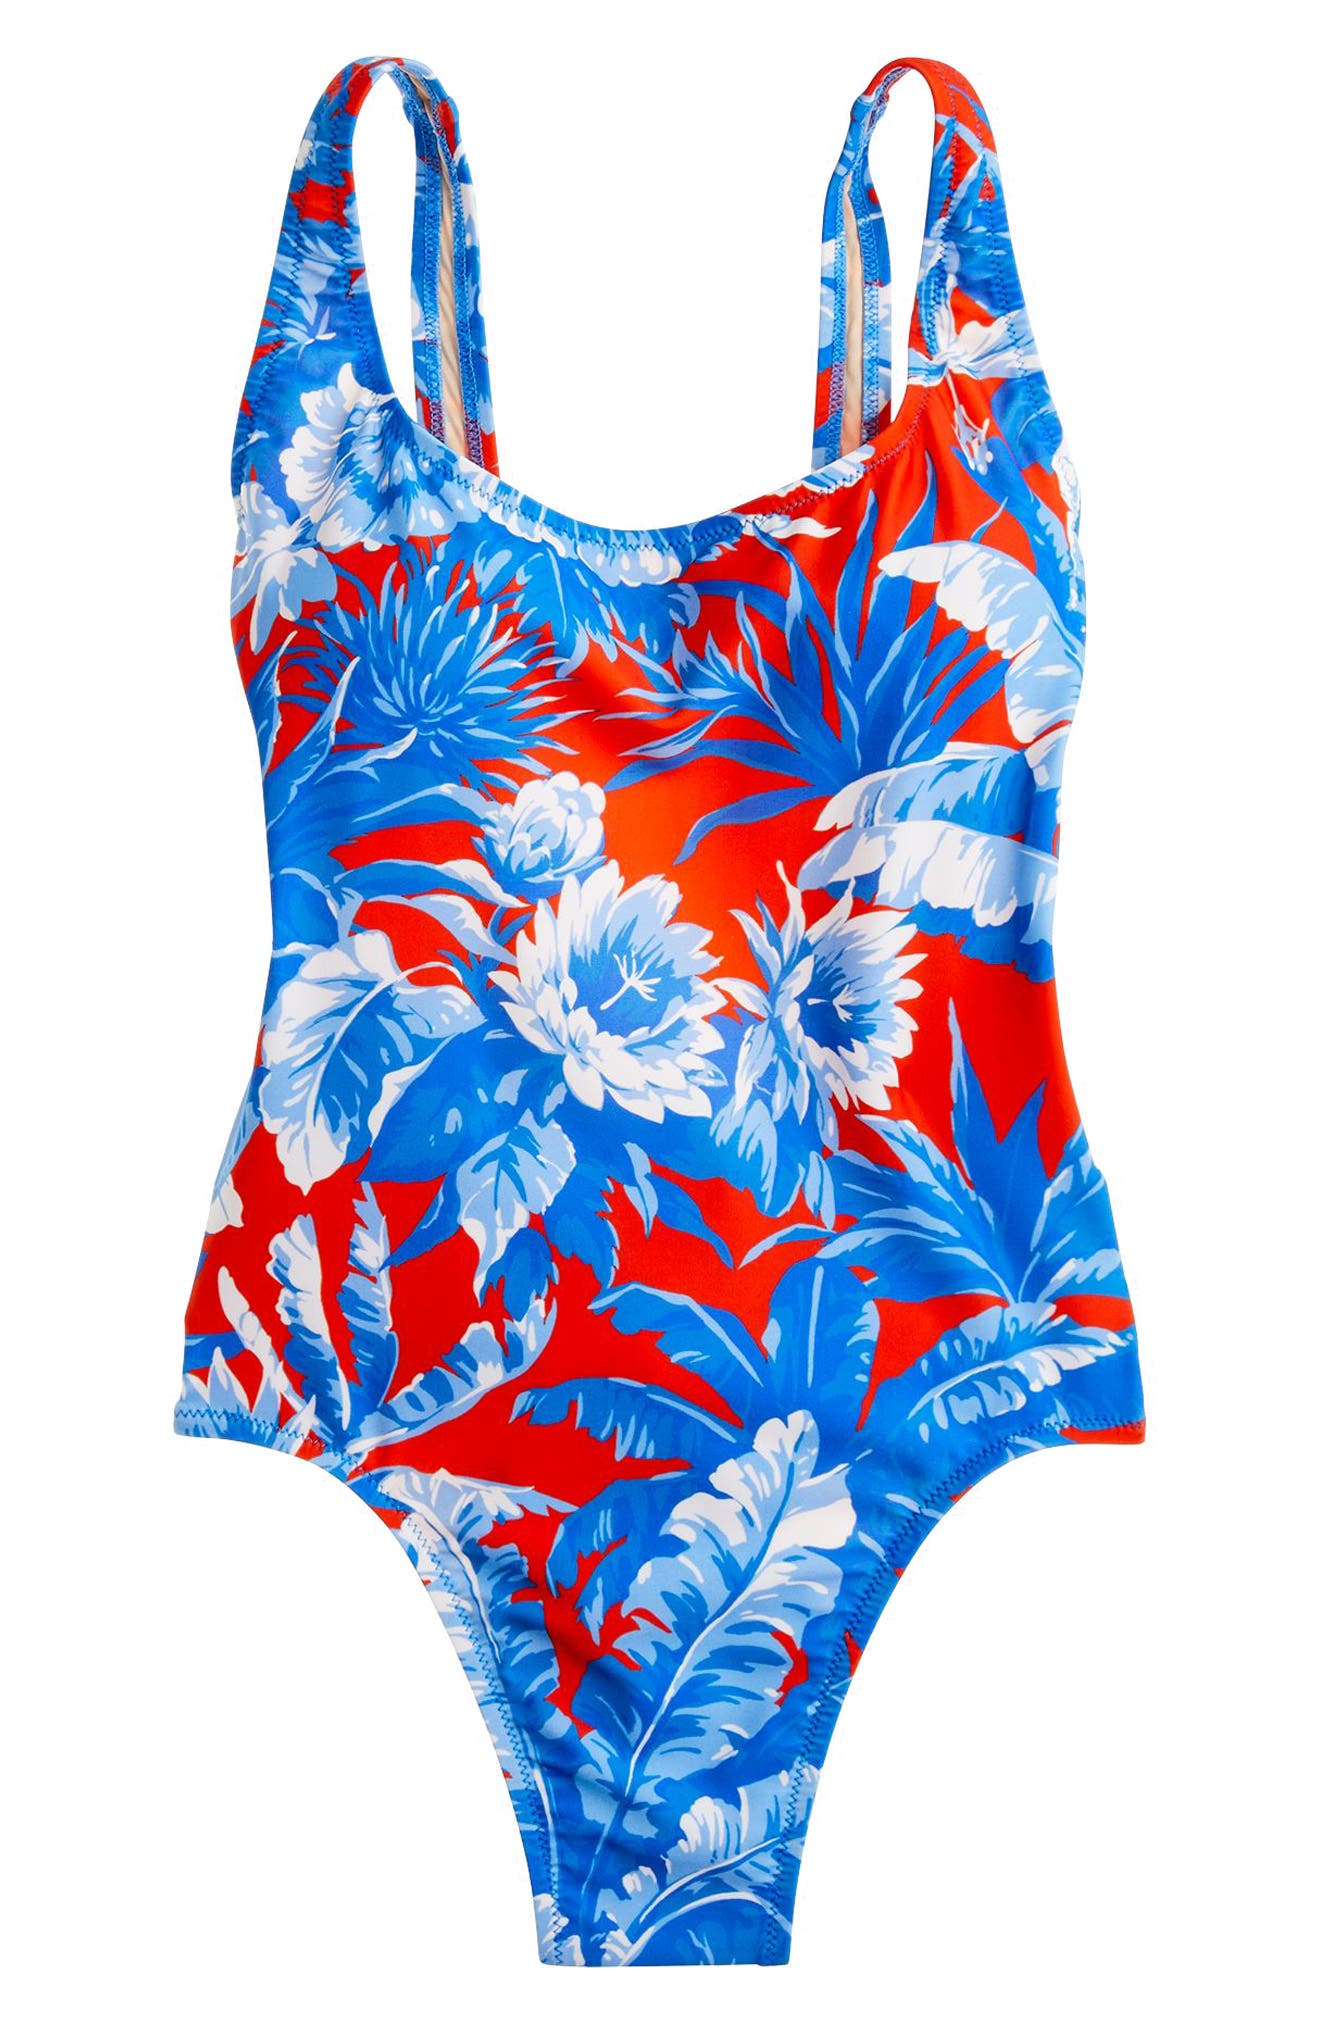 Ratti Rio Floral One-Piece Swimsuit,                             Alternate thumbnail 4, color,                             Blue Multi